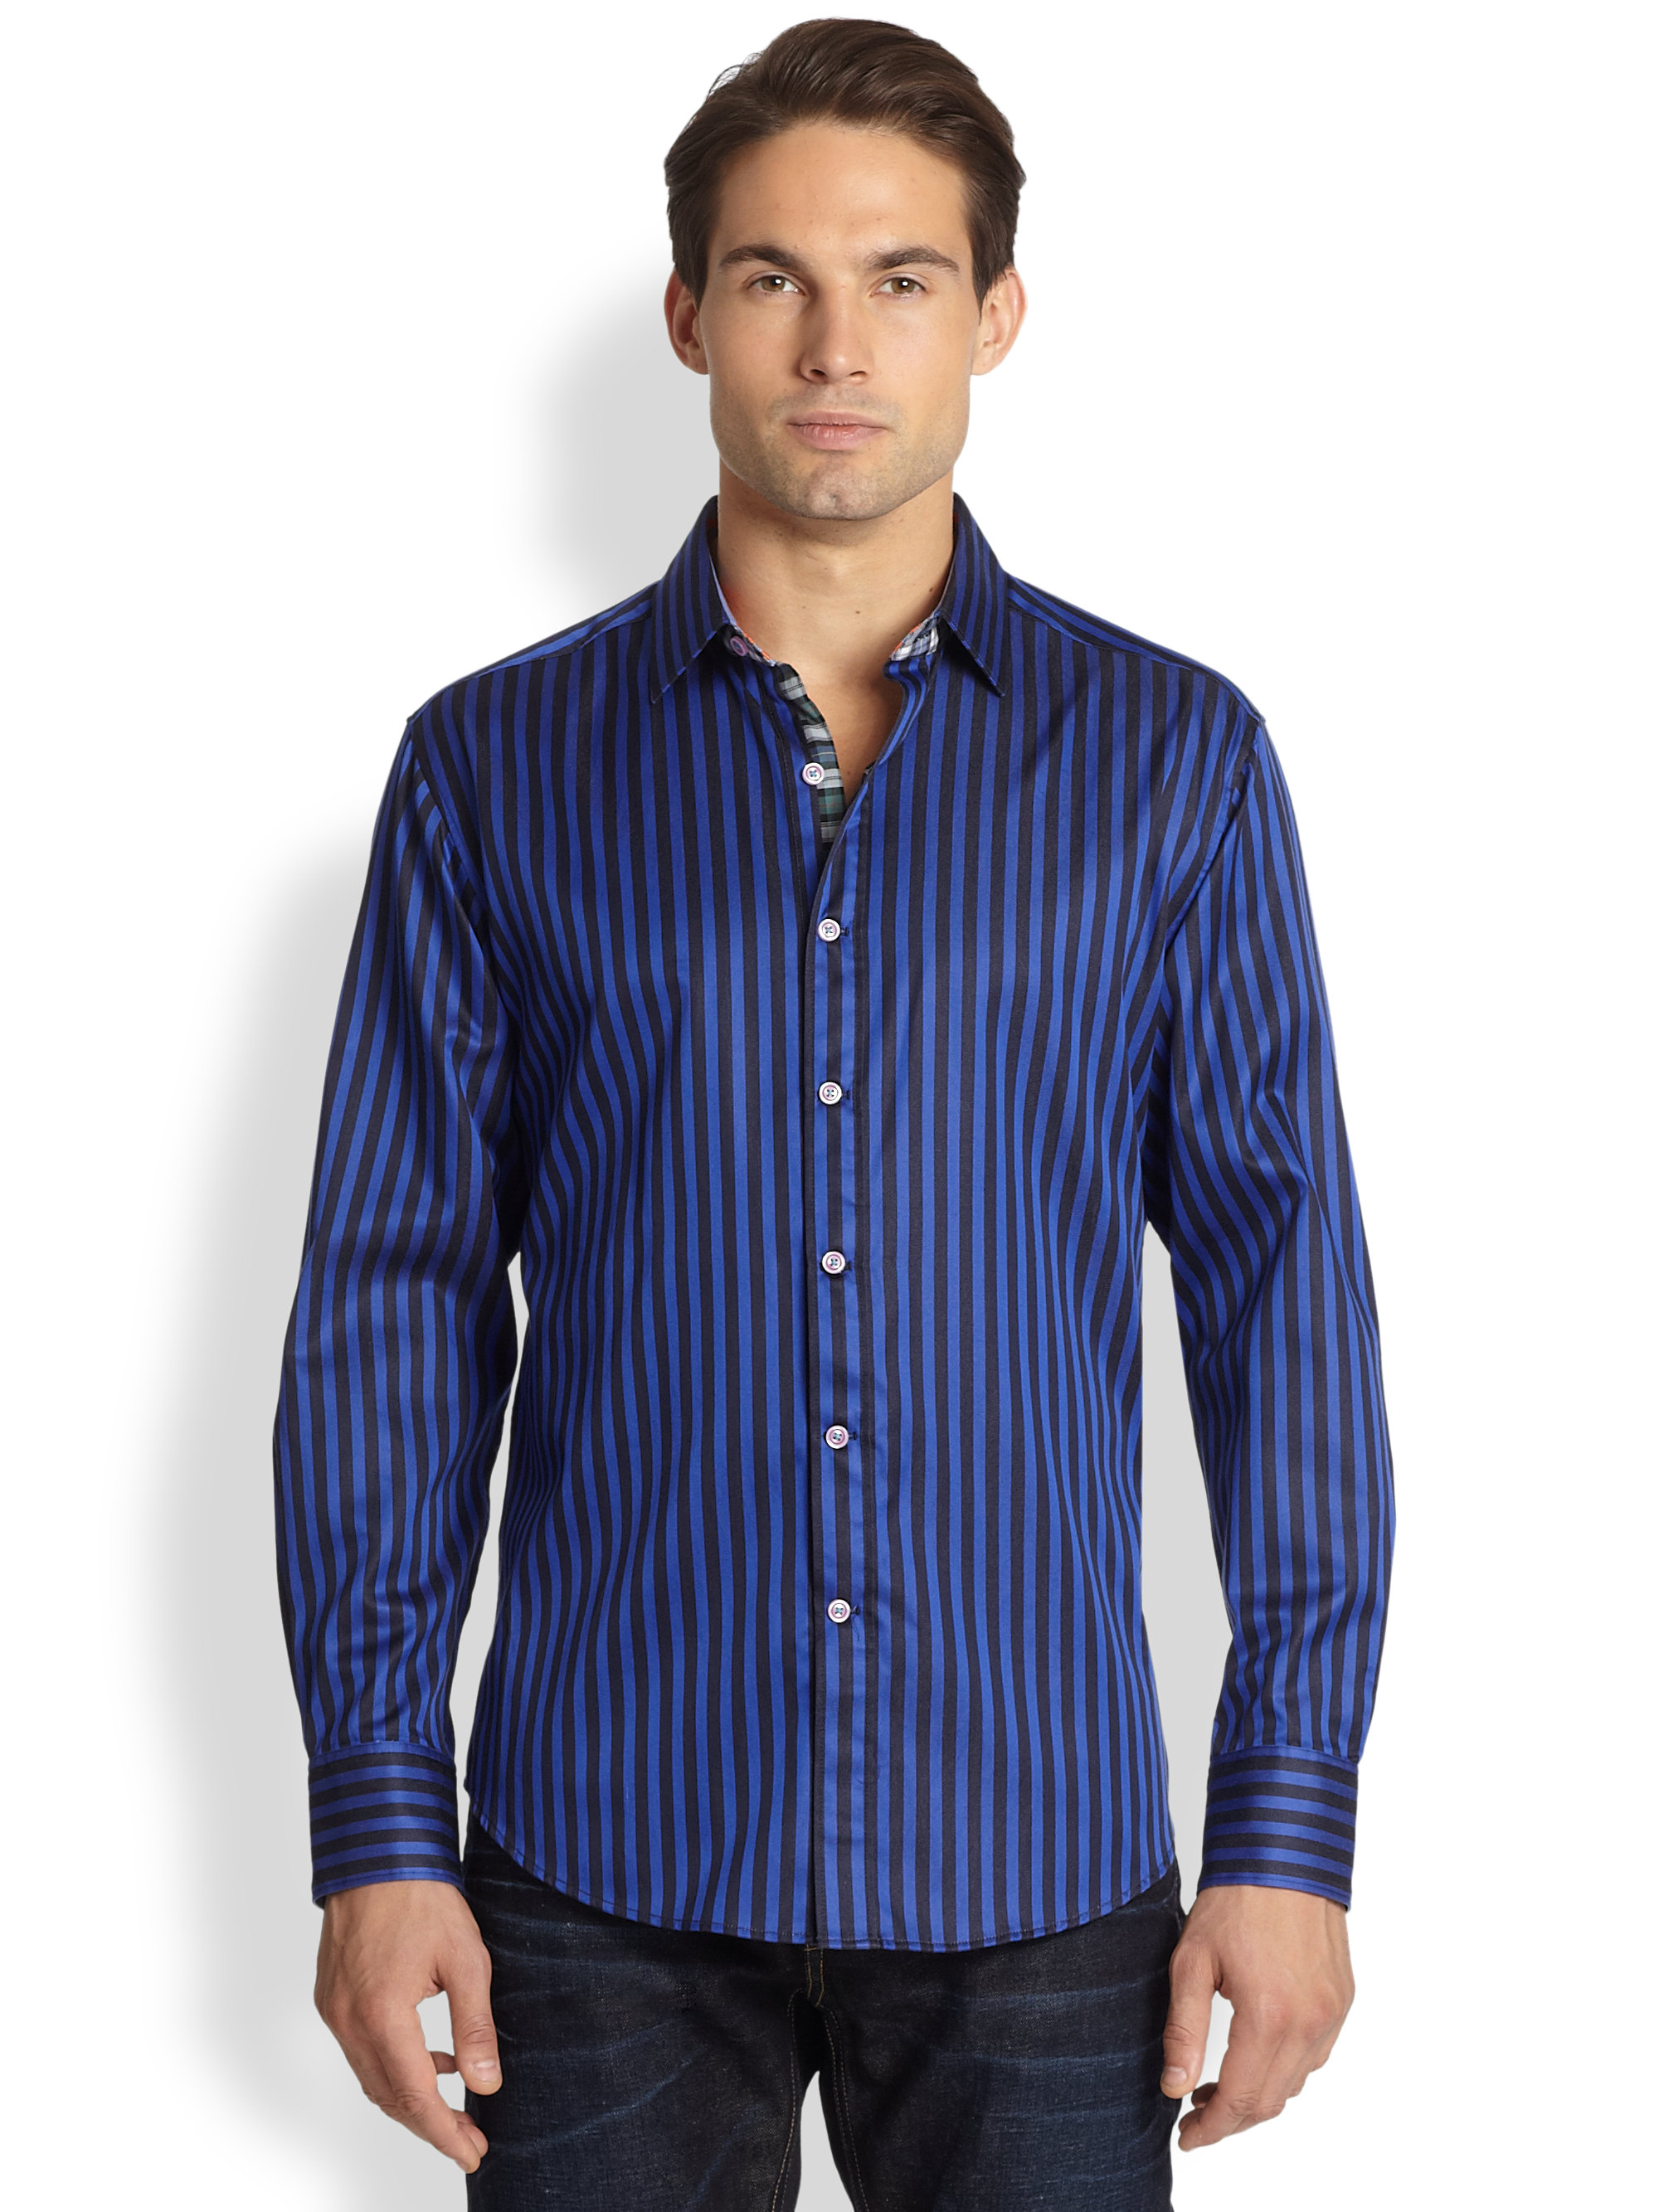 Robert Graham Balik Striped Cotton Shirt in Blue for Men ... Robert Graham Designer